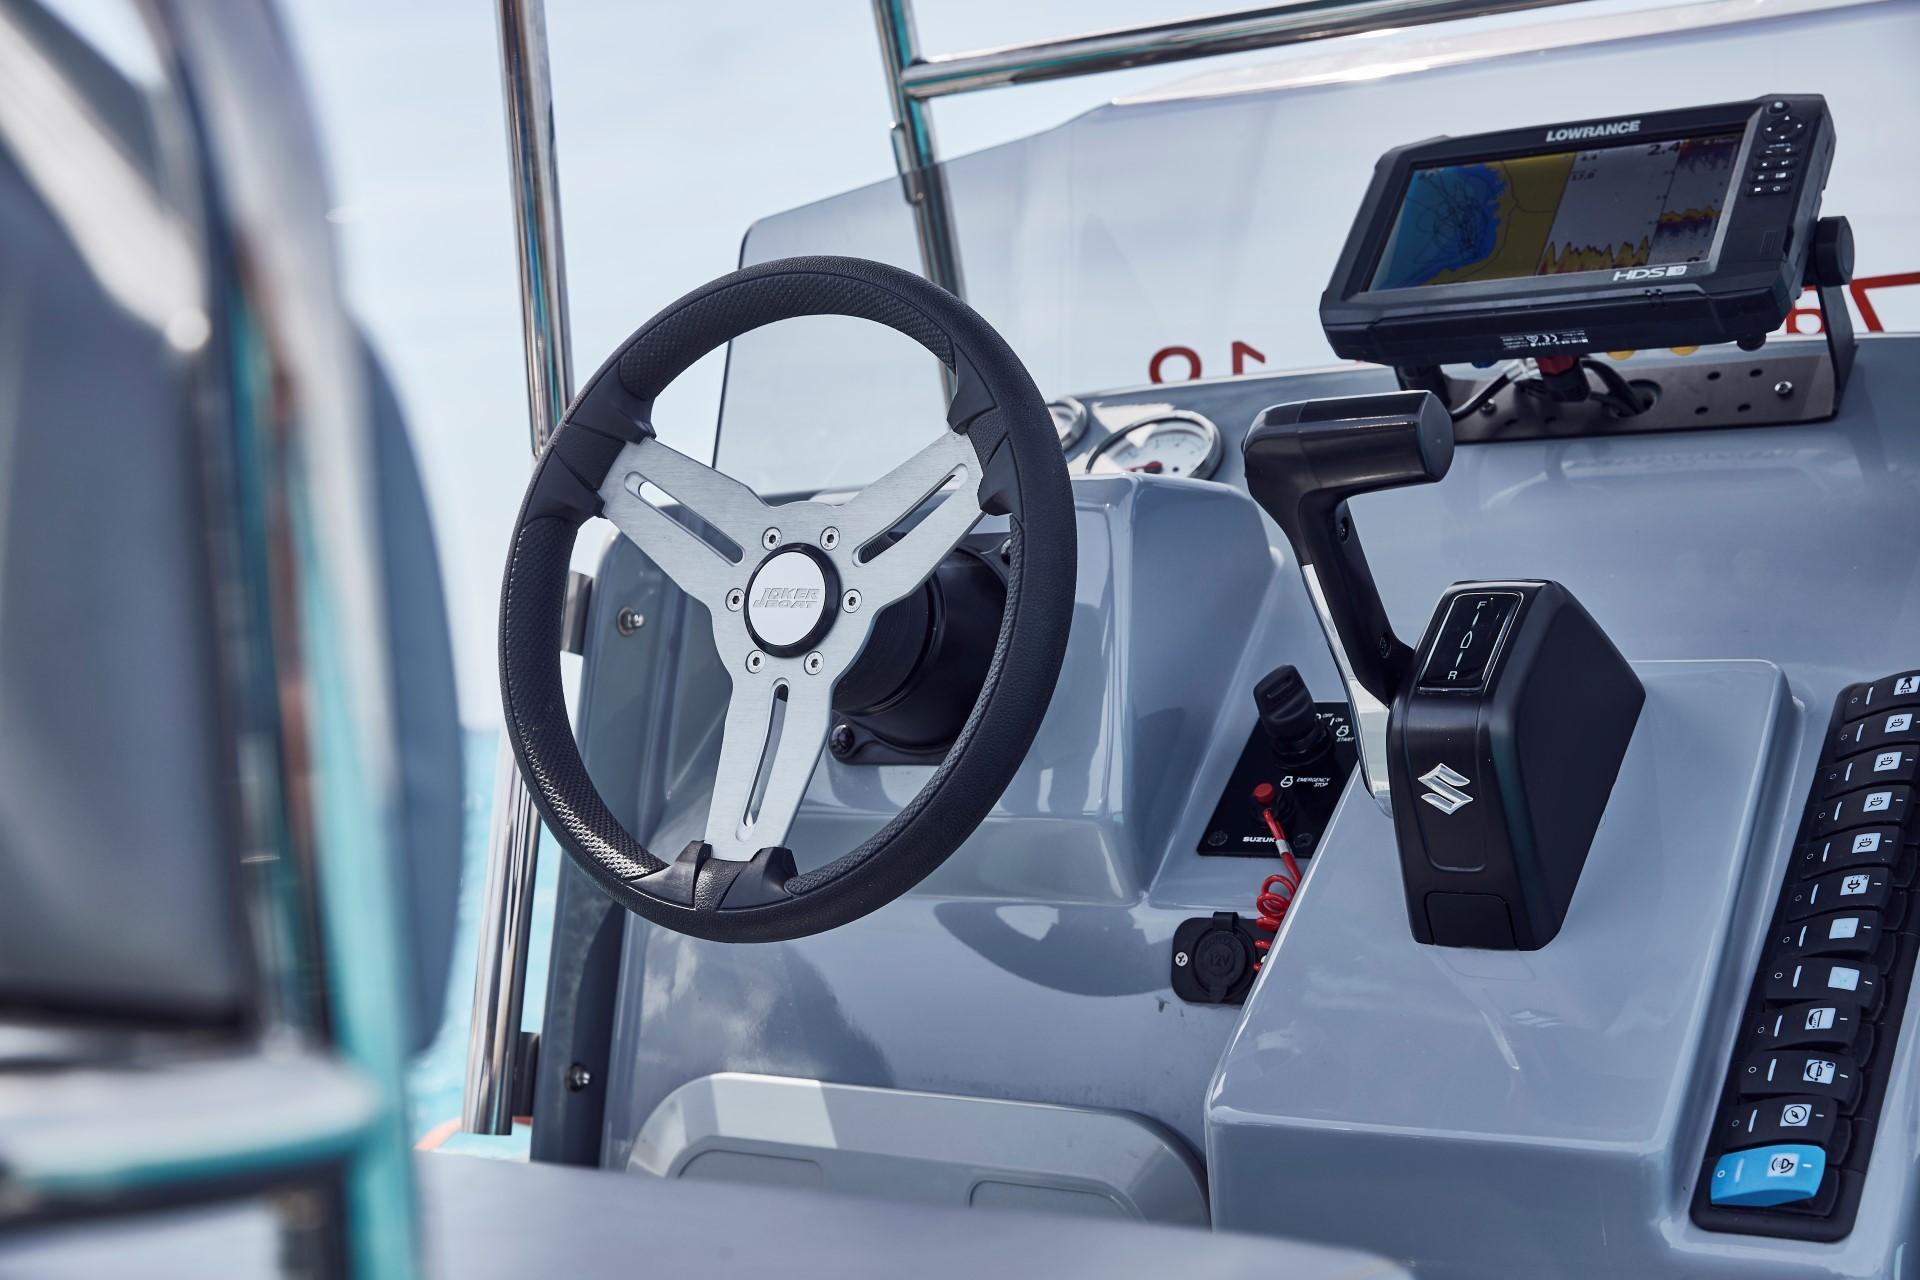 Joker Boat Barracuda driving console